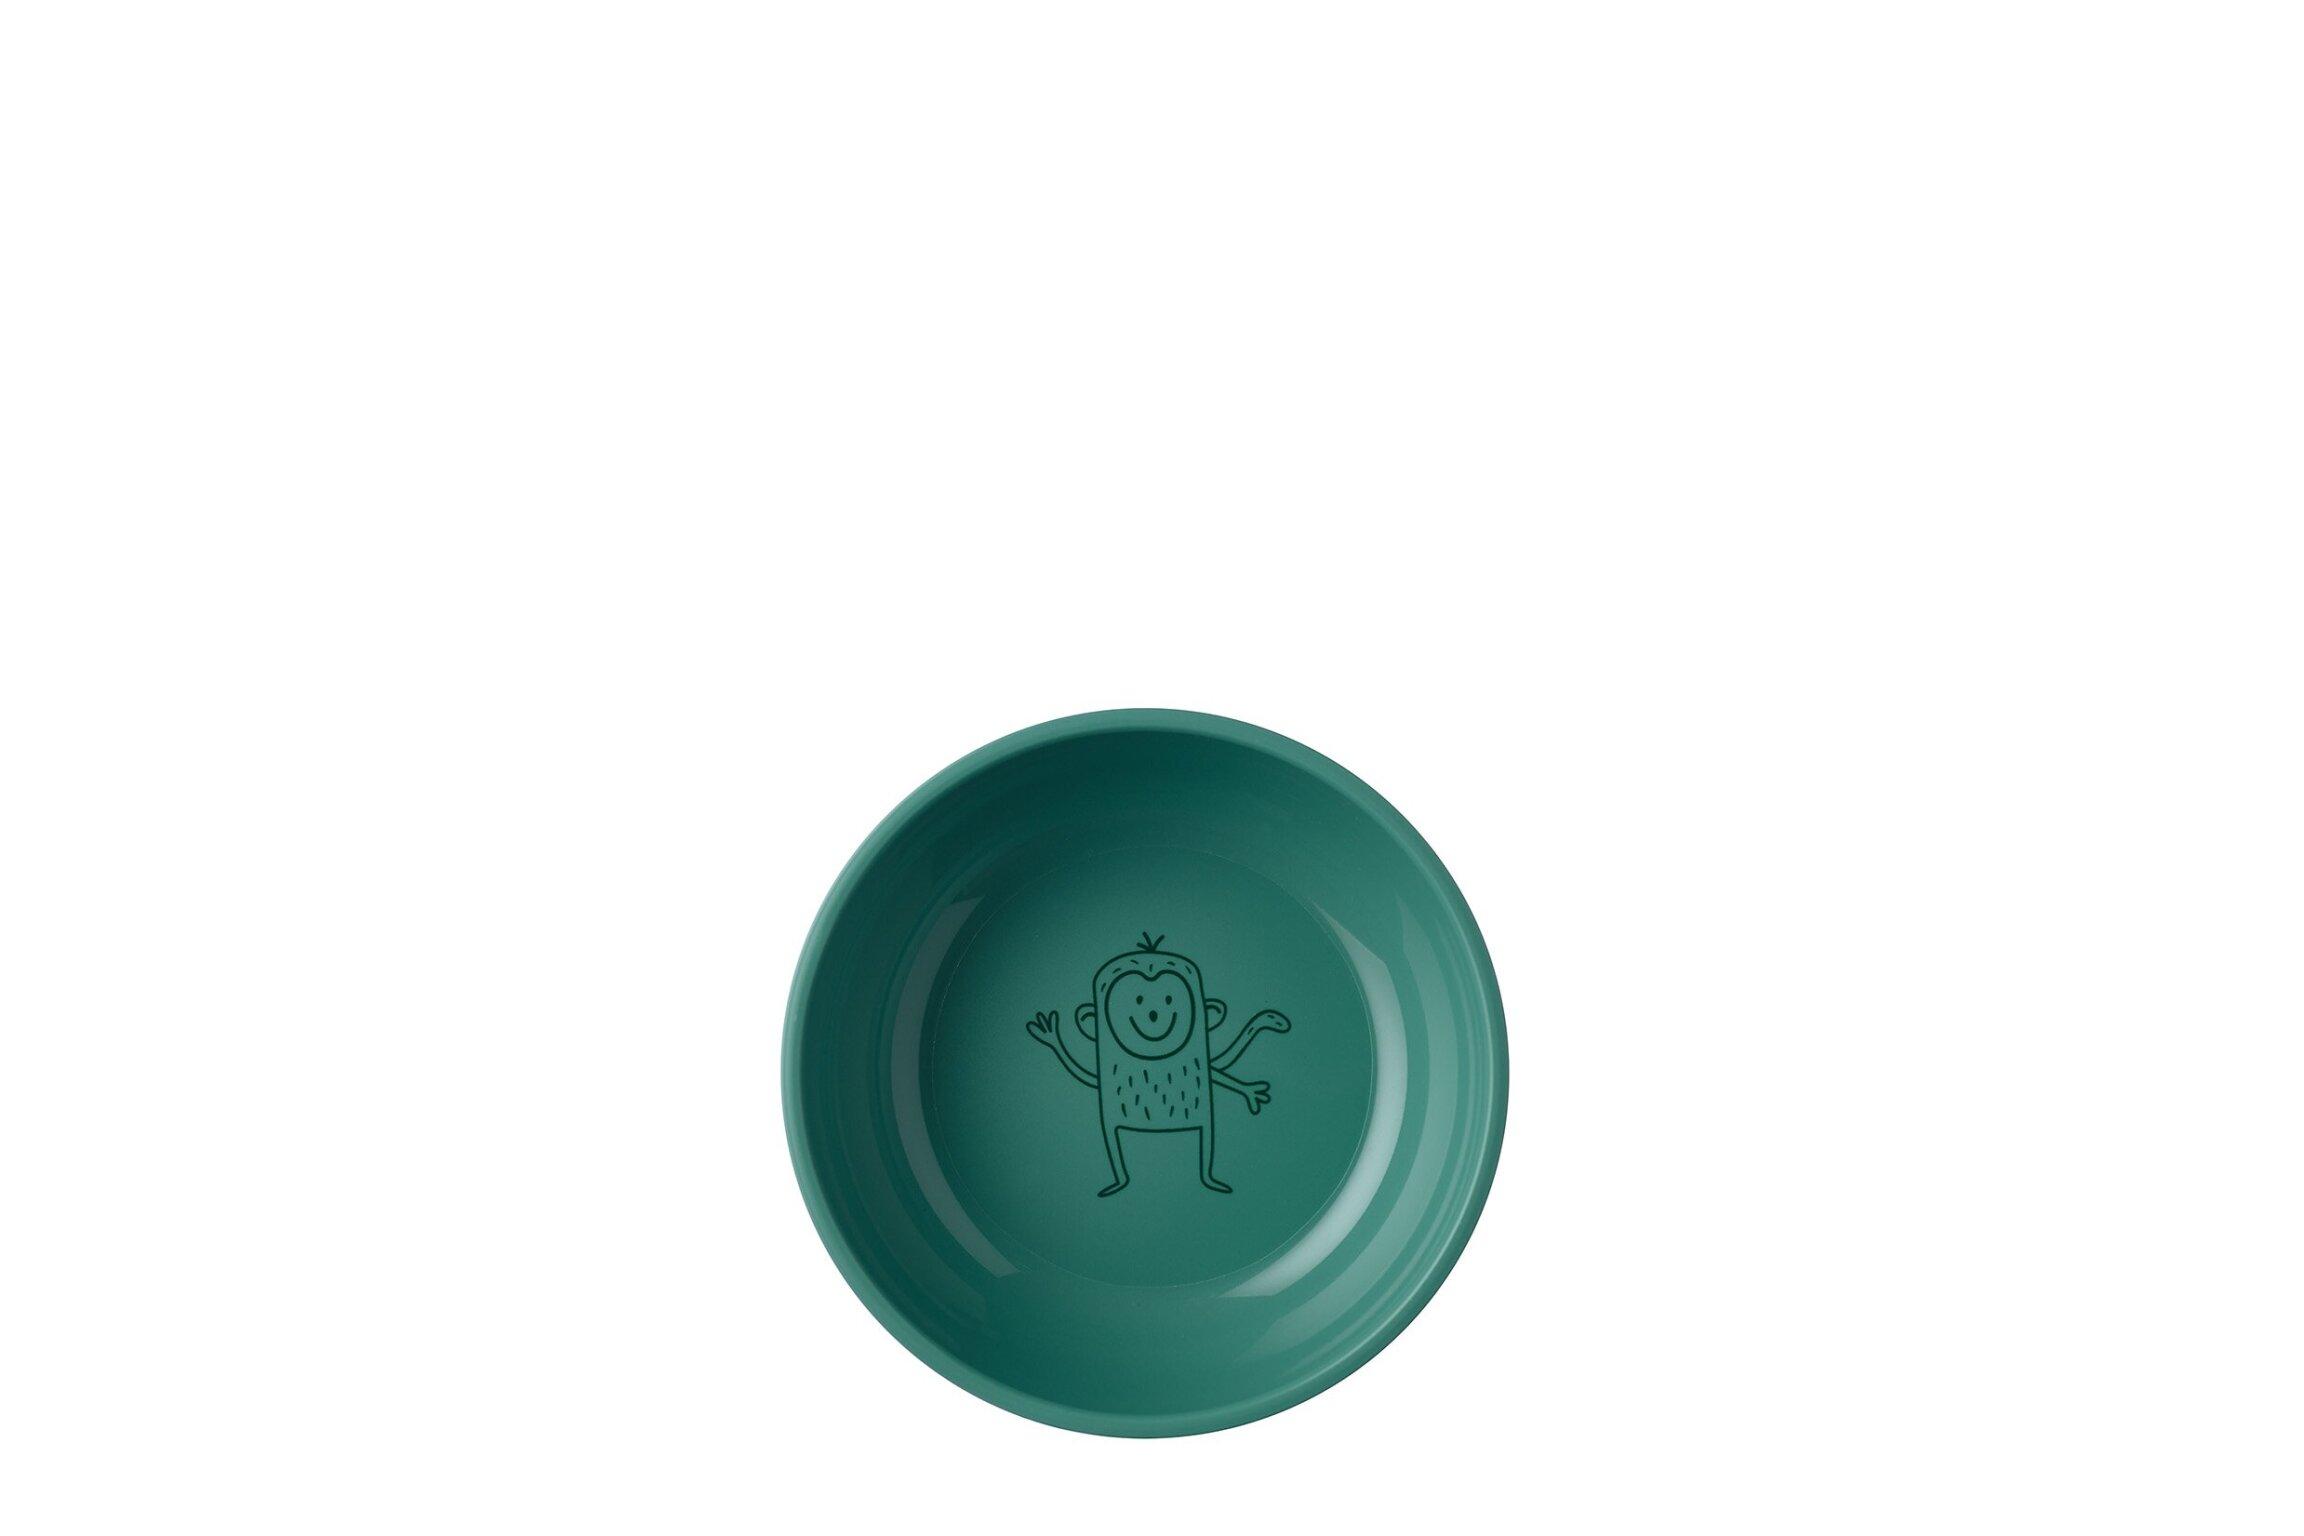 MEPAL Kinderschale Mepal Mio - deep turquoise